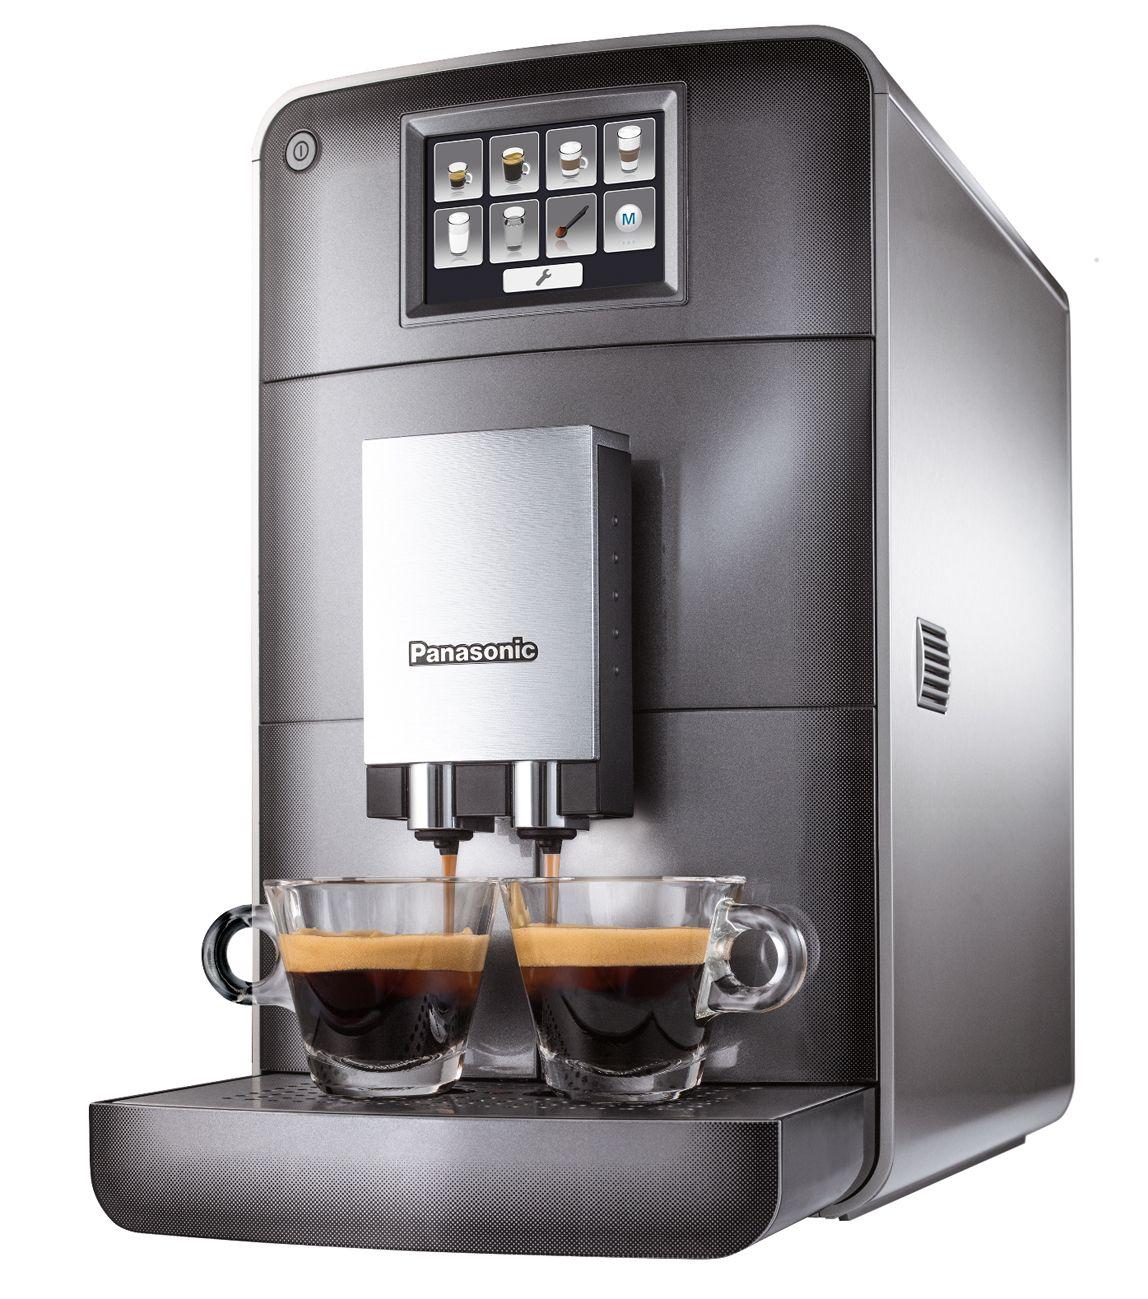 Kaffeevollautomat Kaffeevollautomat, Kaffee und Kaffee